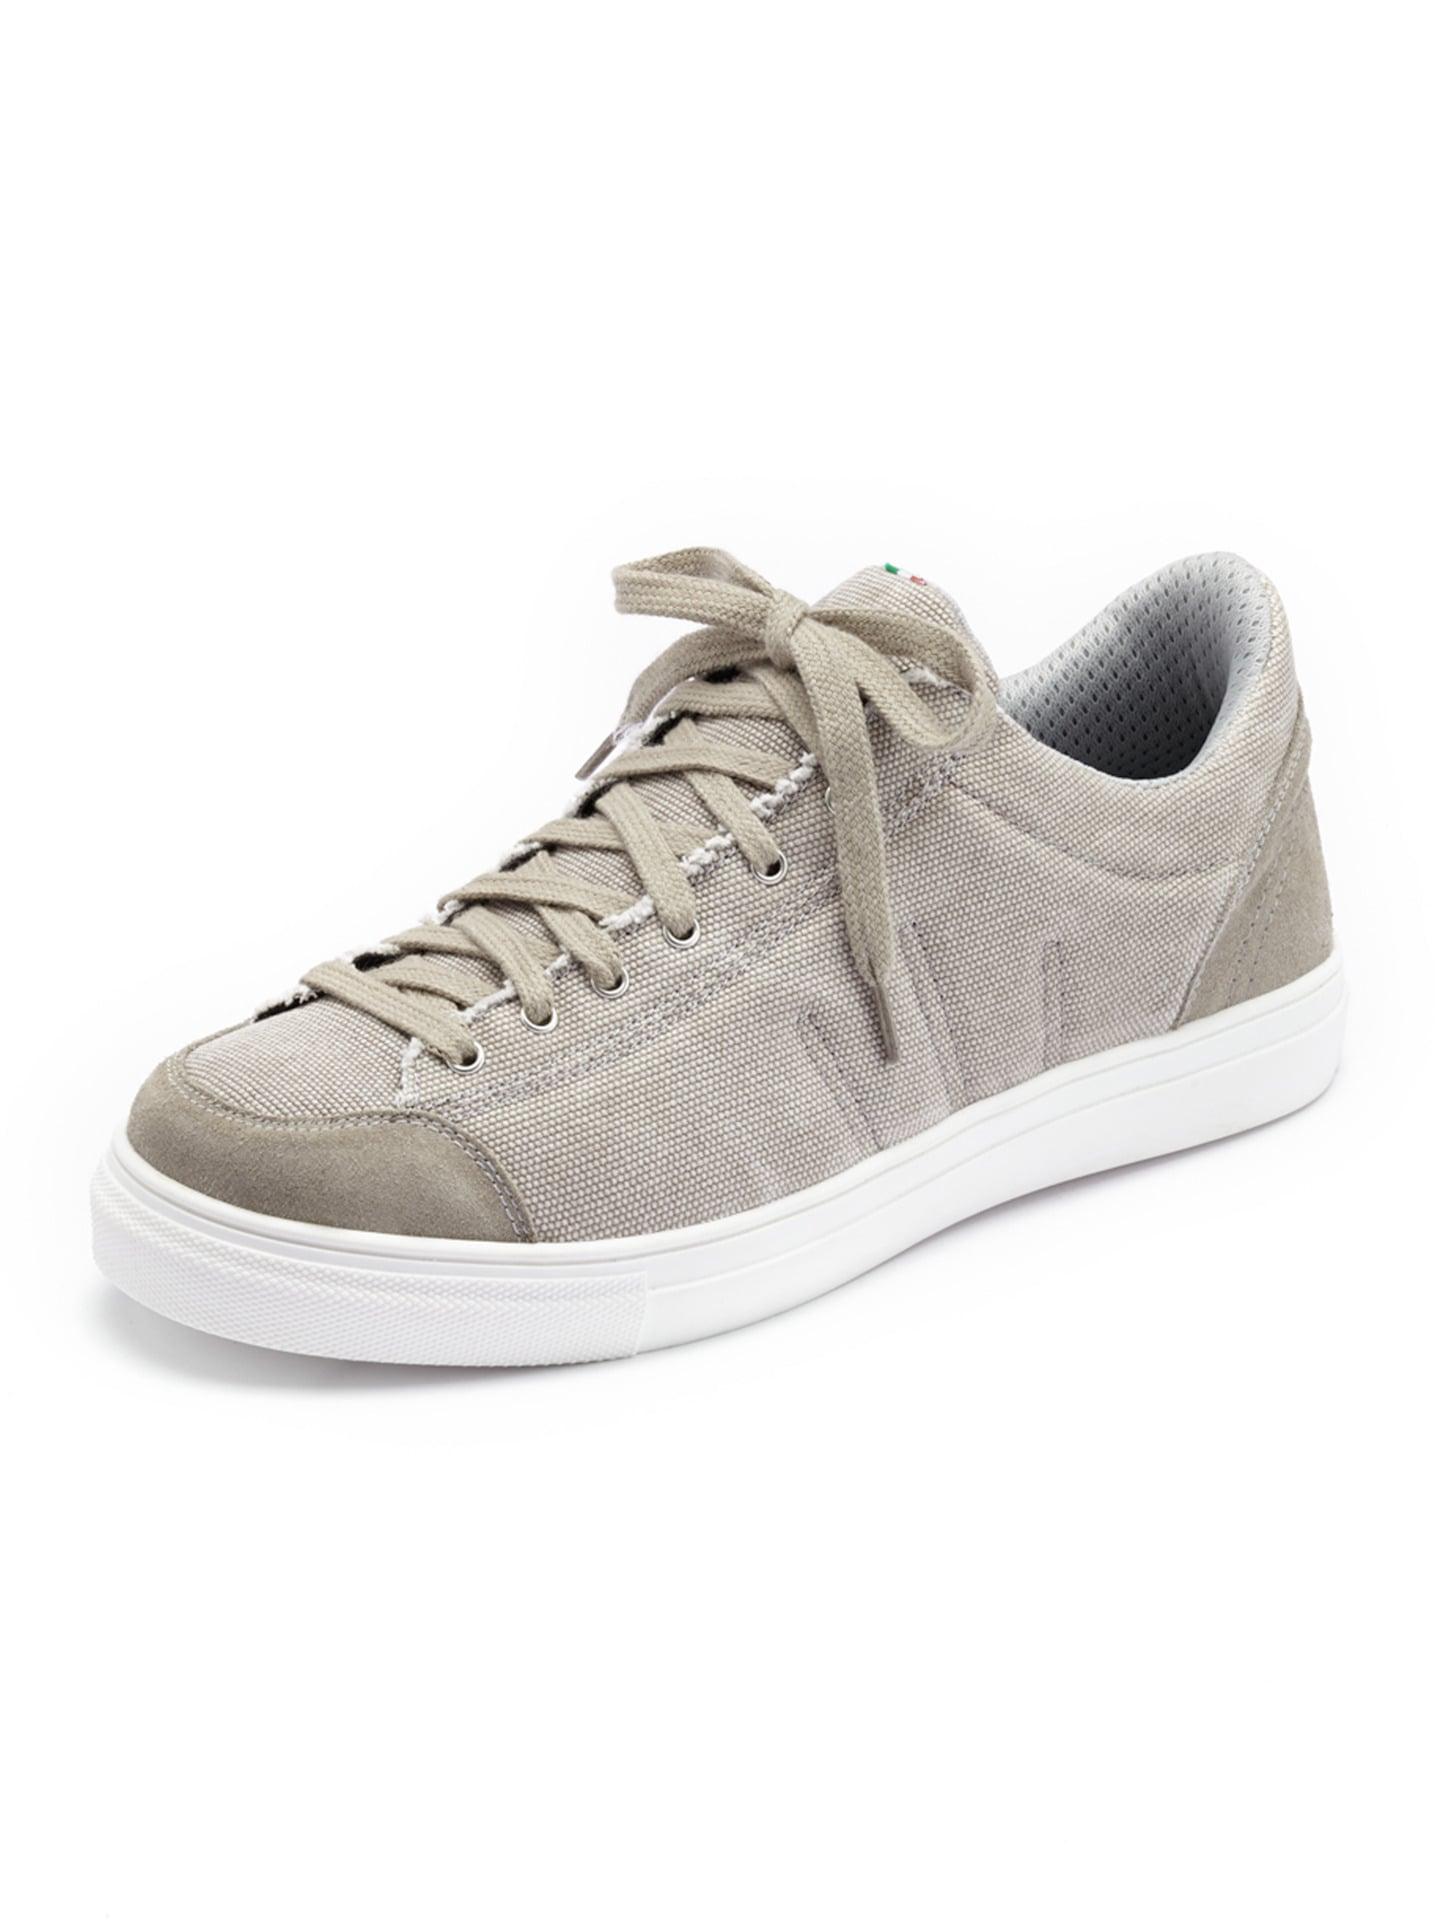 Avena Herren Bequem-Sneaker Fußfreude Grau